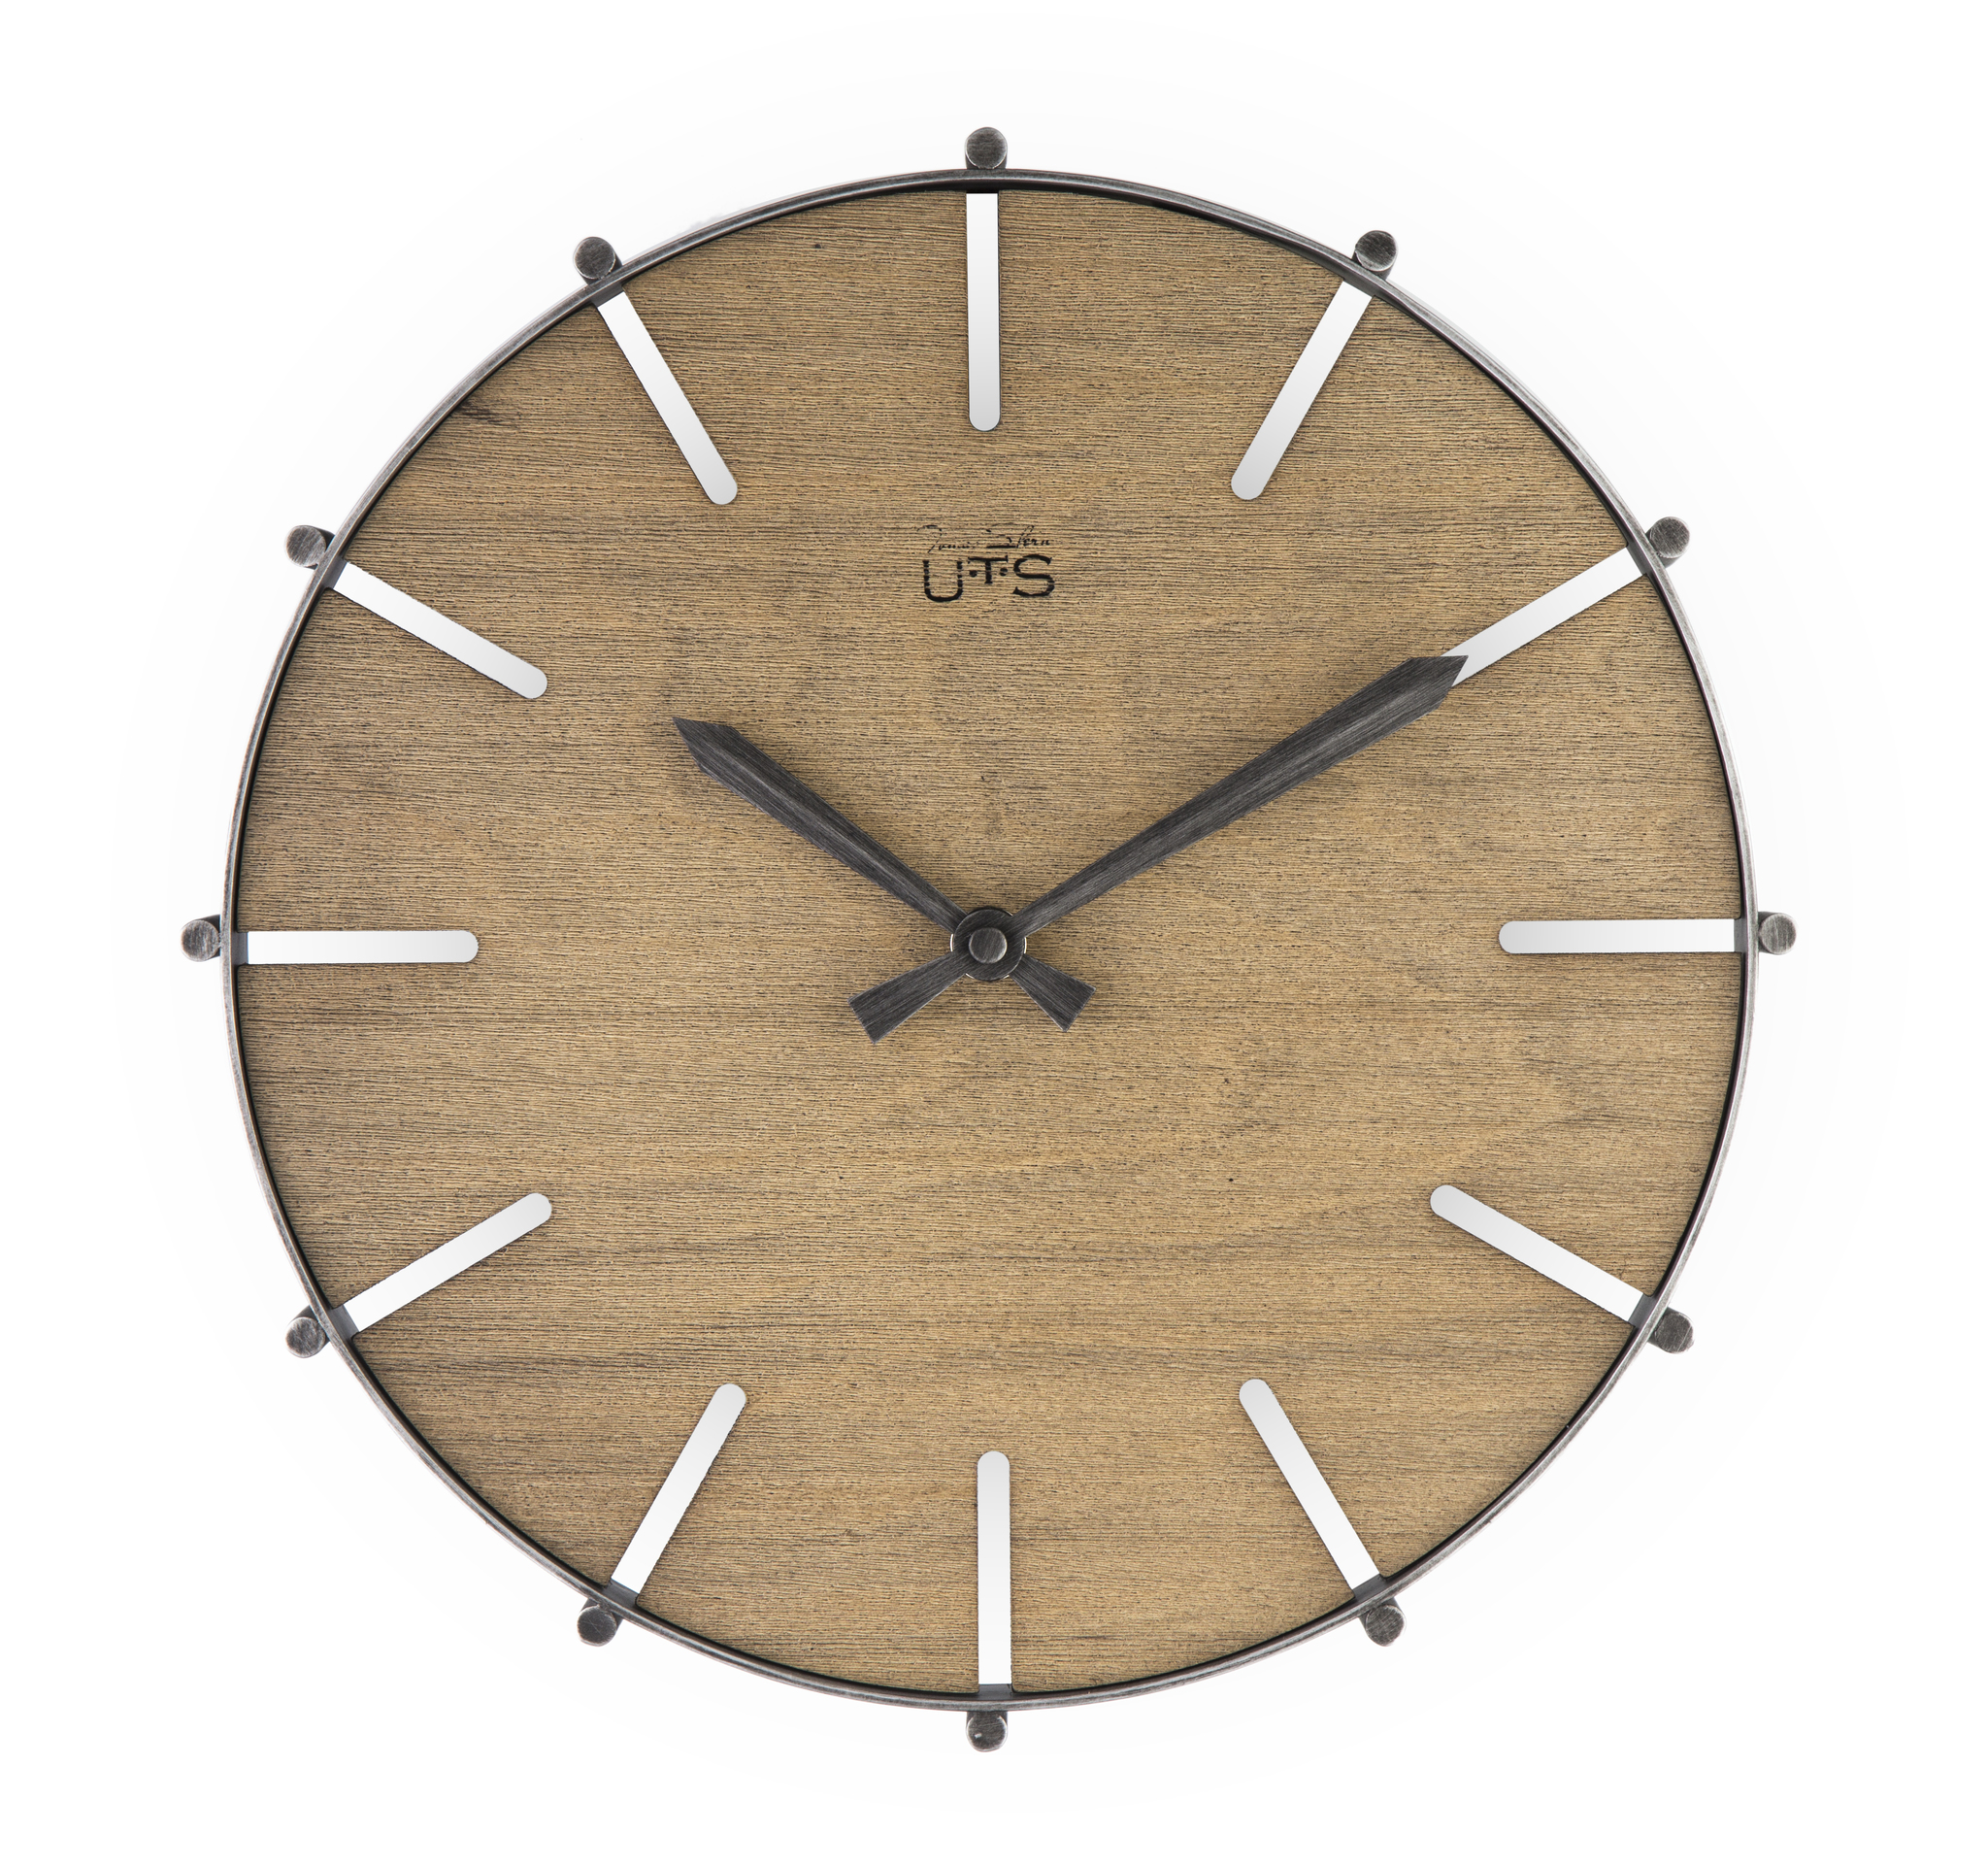 Часы настенные Часы настенные Tomas Stern 9034 chasy-nastennye-tomas-stern-9034-germaniya.jpg